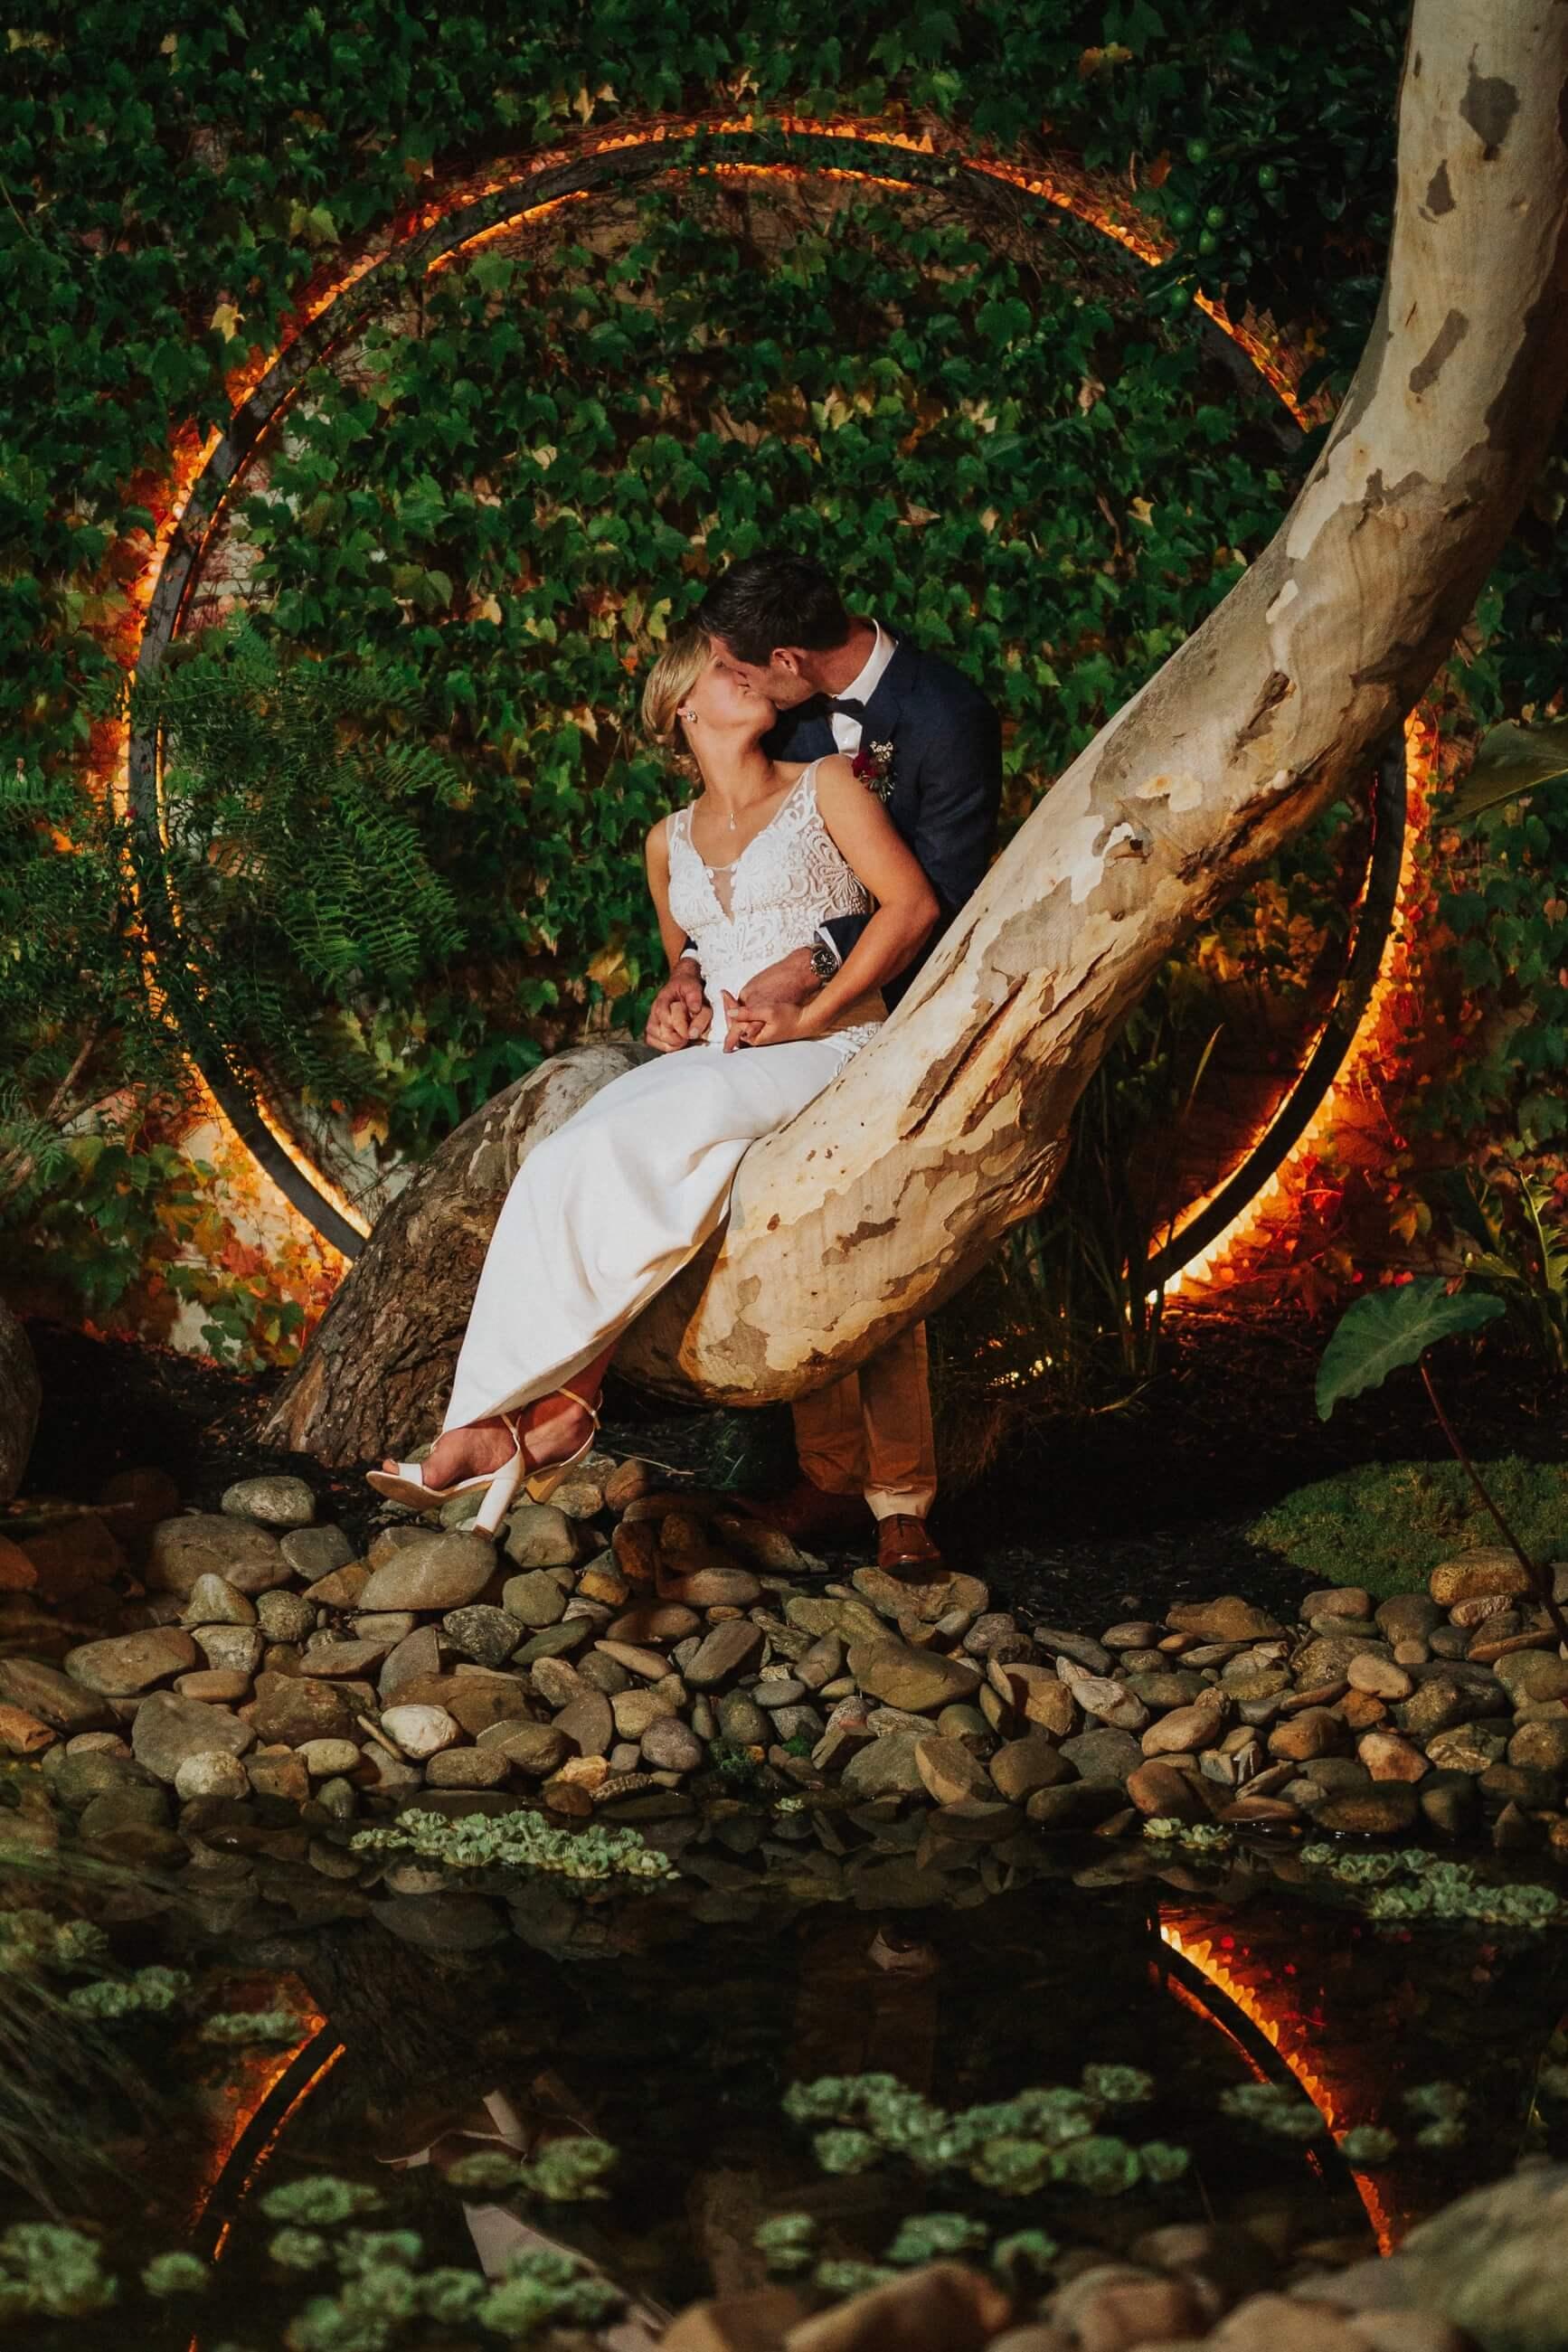 natasha-and-simon-projekt-3488-wedding-highres-0698.jpg